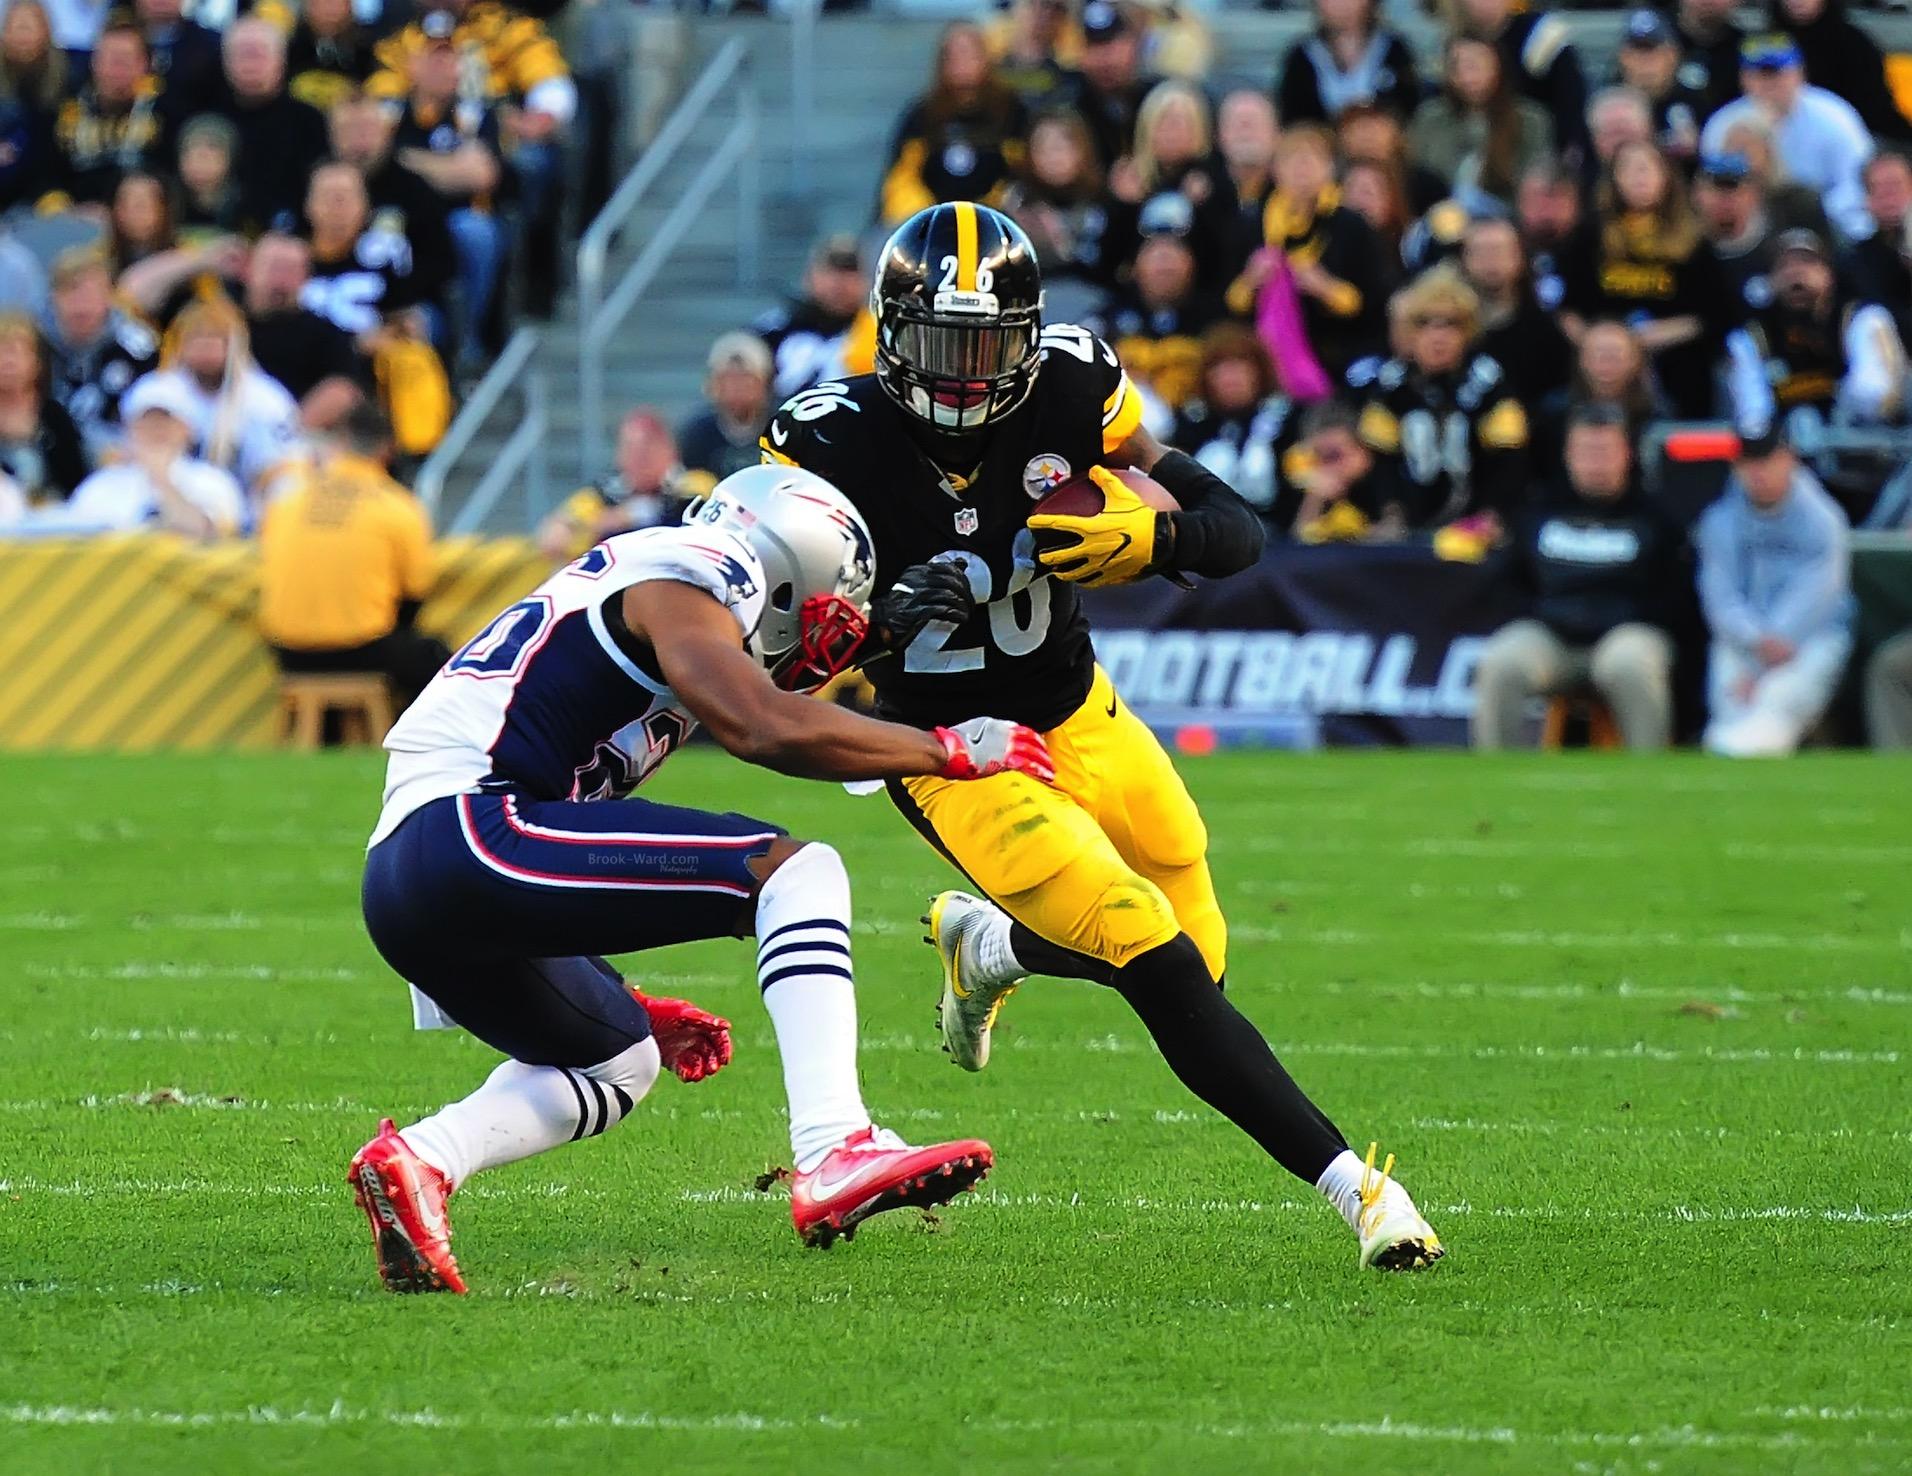 Bell against Patriots defender